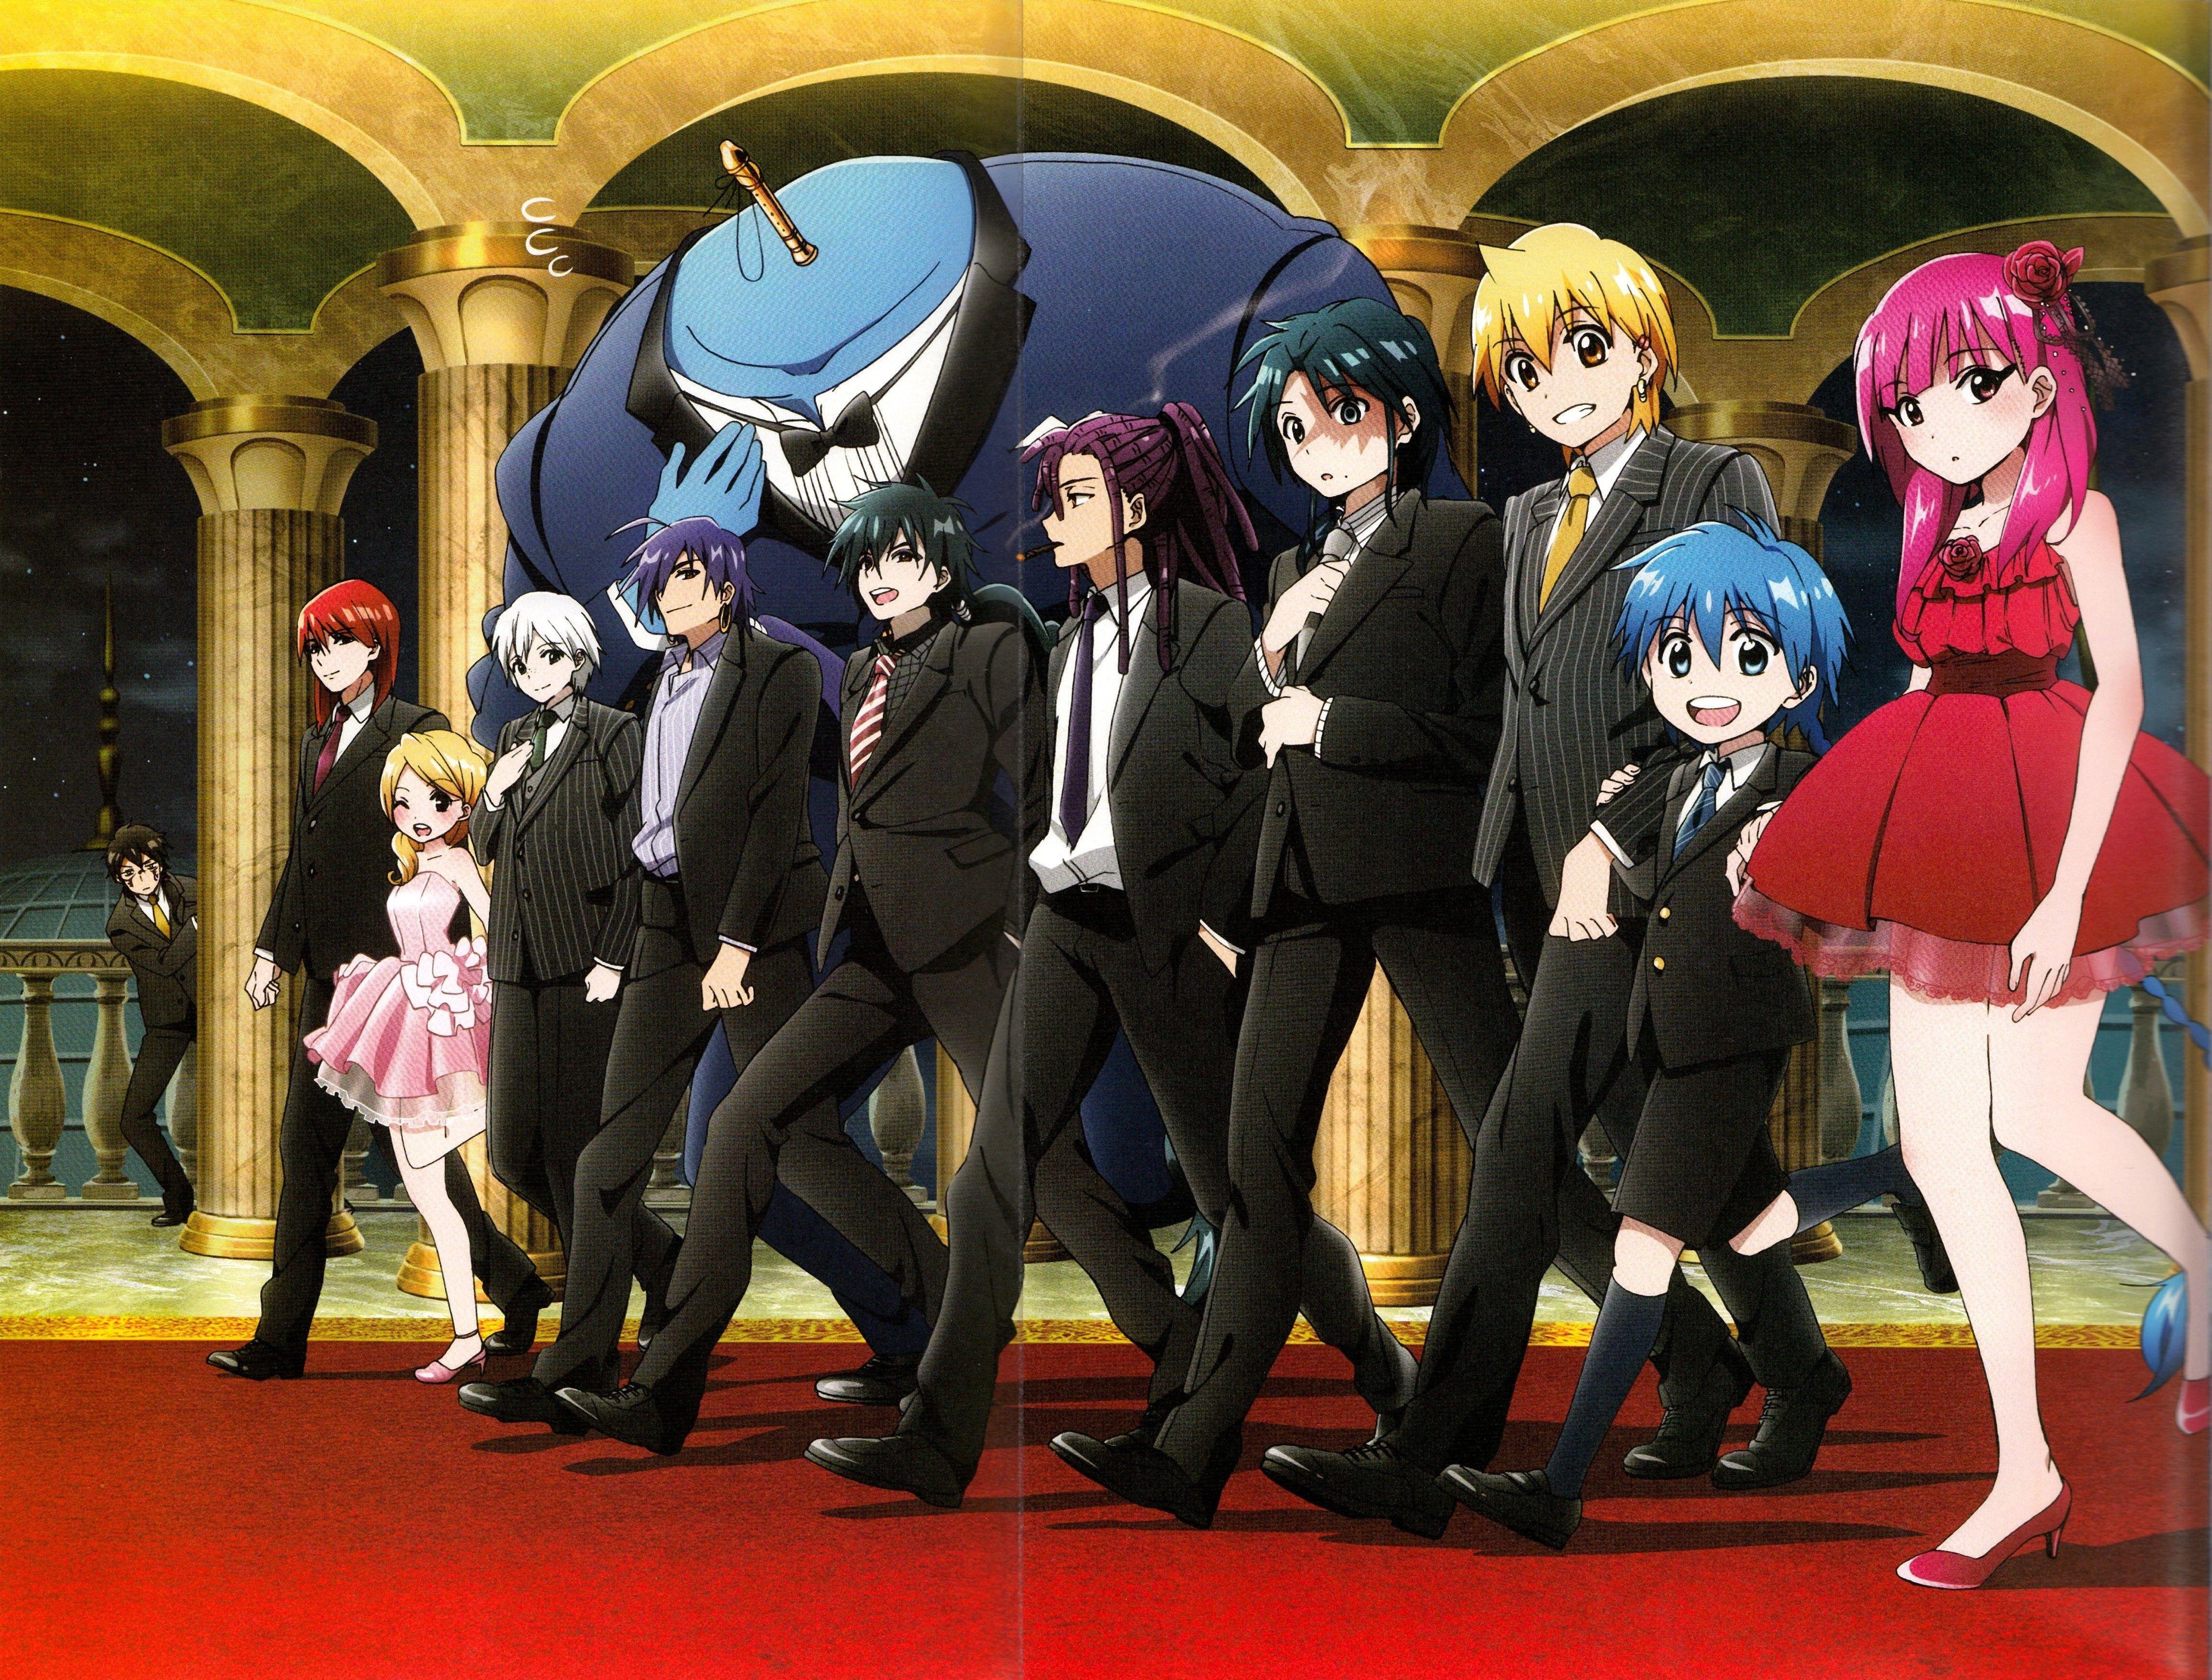 MAGI The Labyrinth of Magic (With images) Anime magi